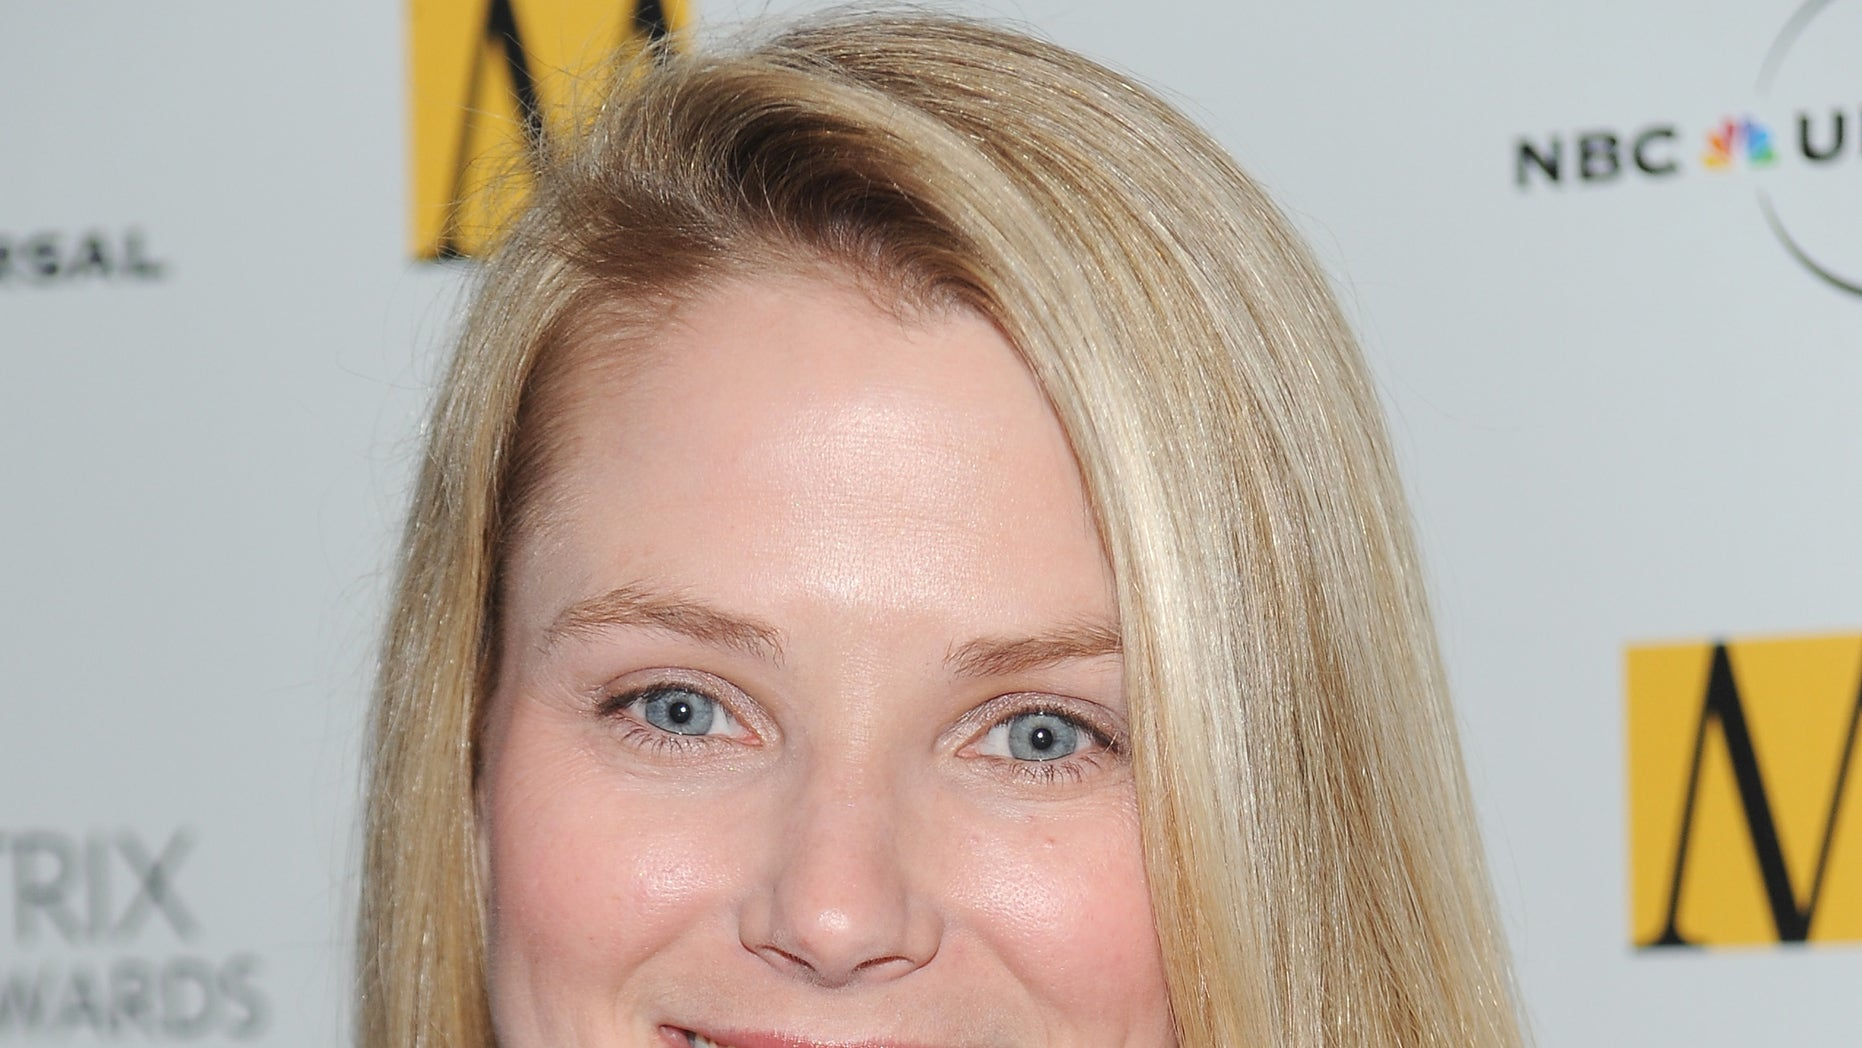 FILE photo of Yahoo CEO Marissa Mayer